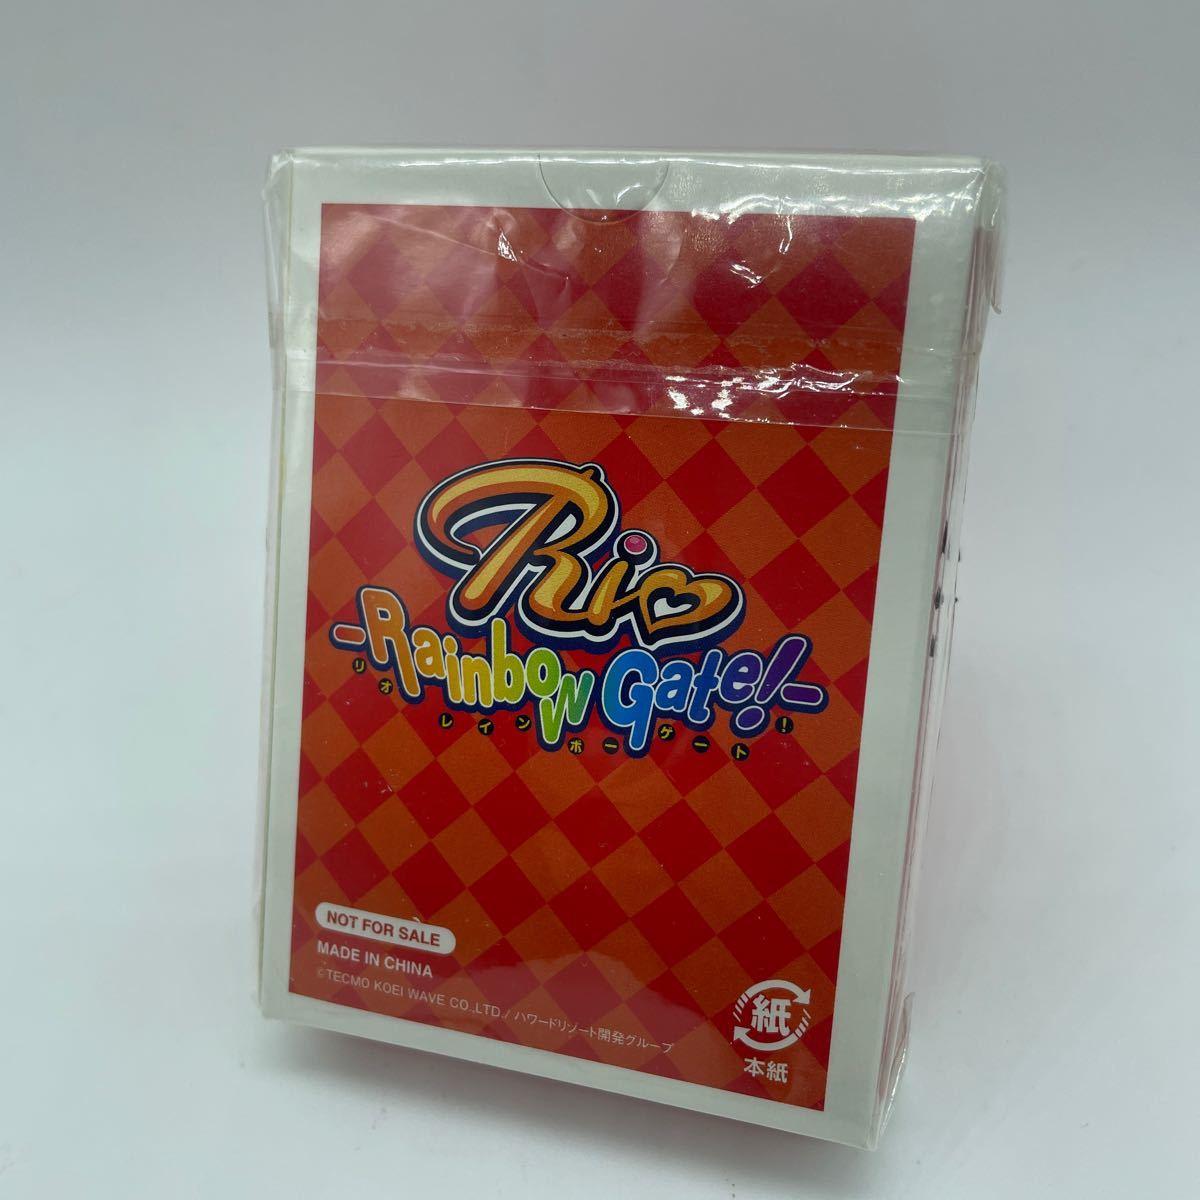 (Blu-ray) Rio RainbowGate! 2 (管理:215412)